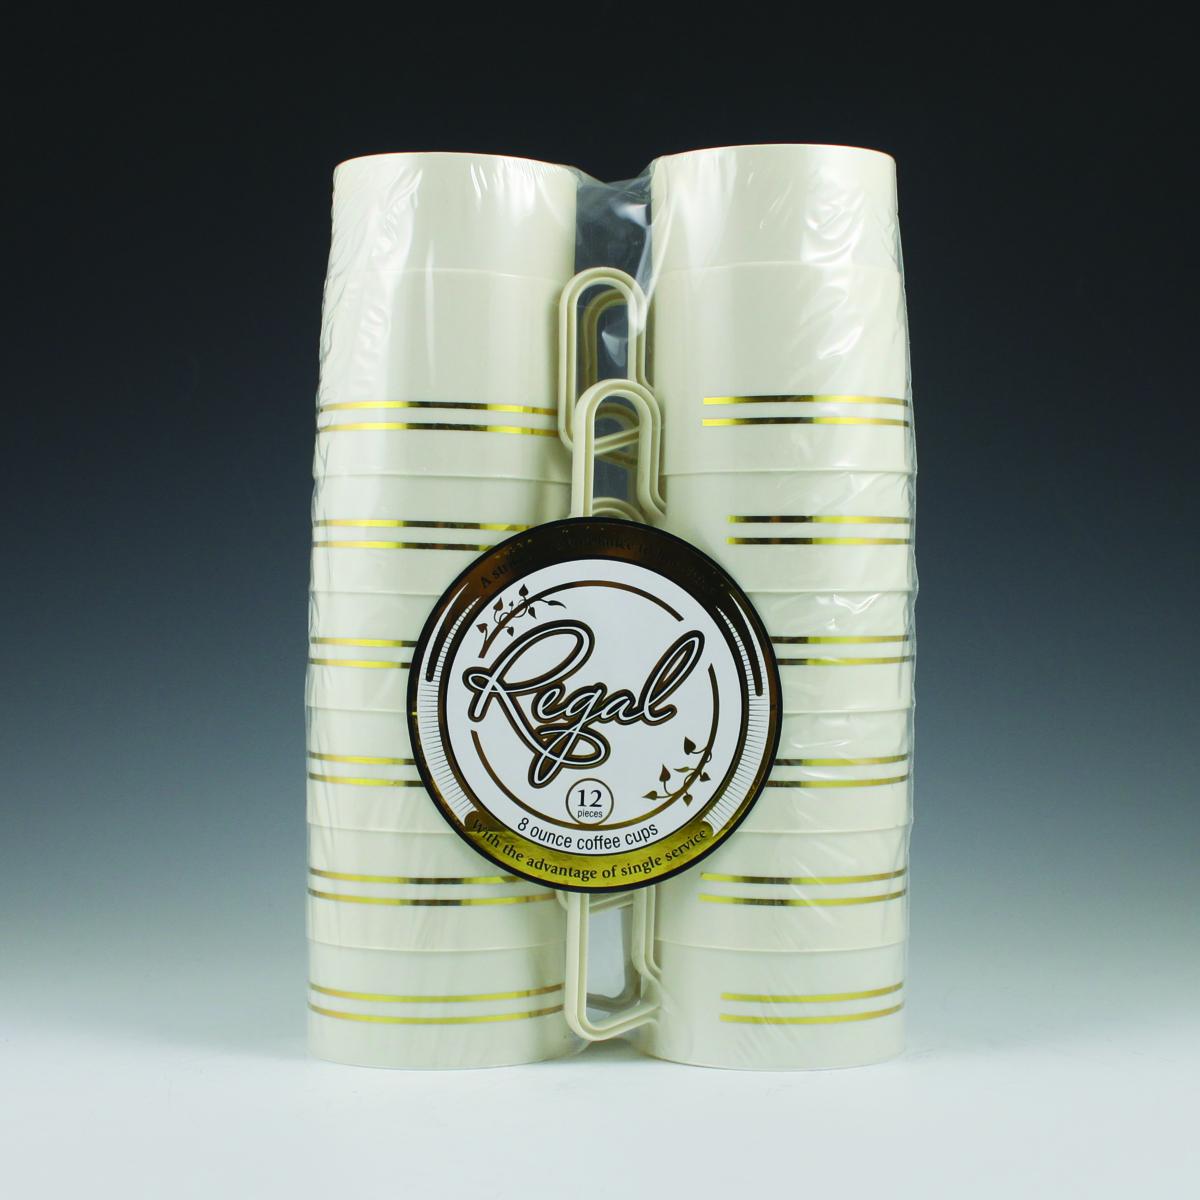 8 Oz Regal Coffee Cup Plastic Cups Utensils Bowls